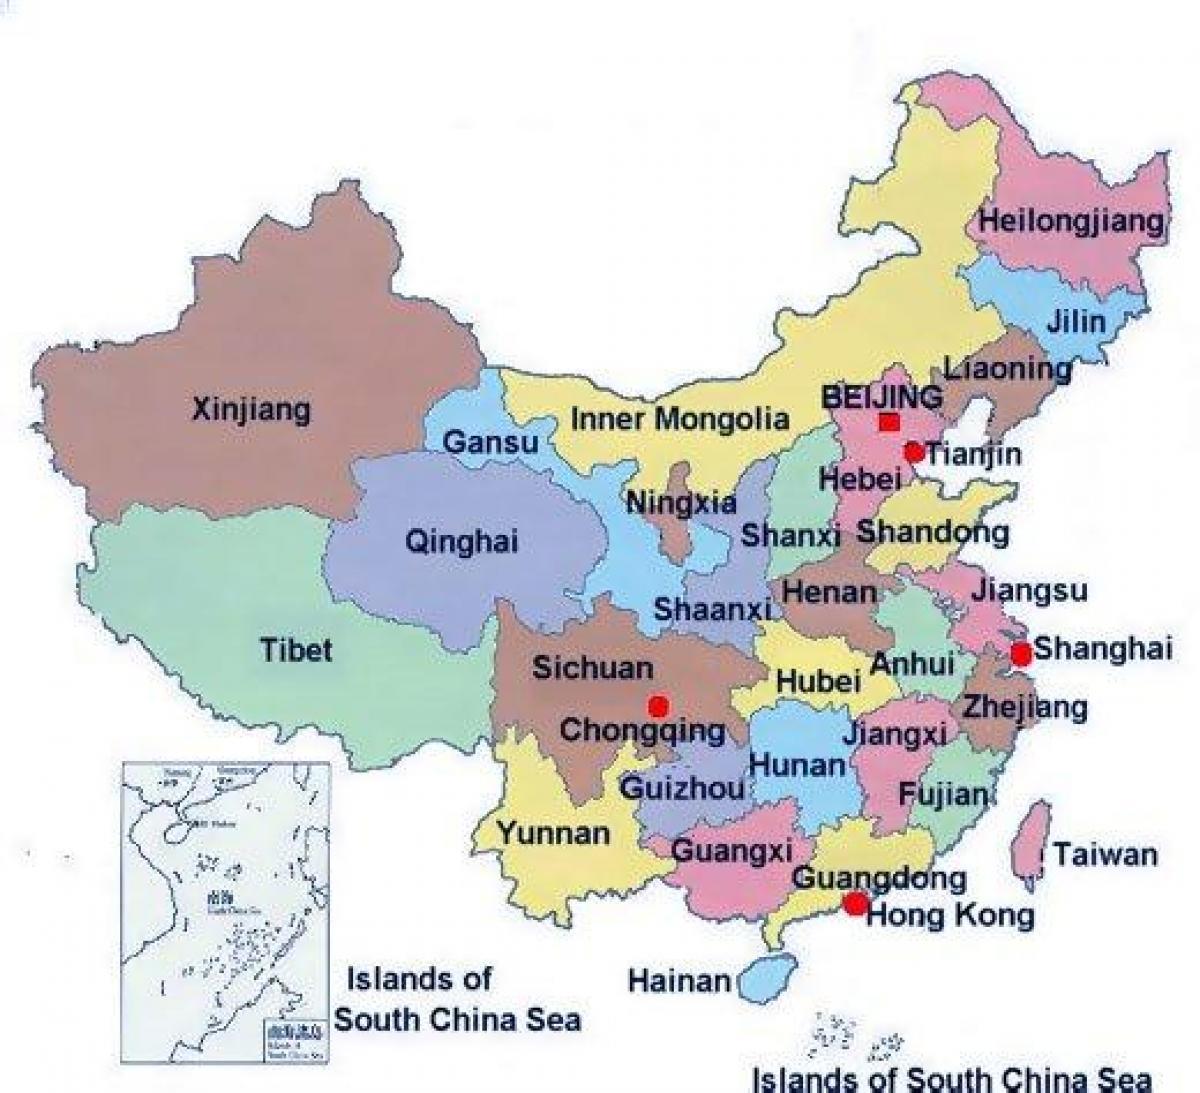 China Peta Image Gambar Asia Timur Tenggara Kosong